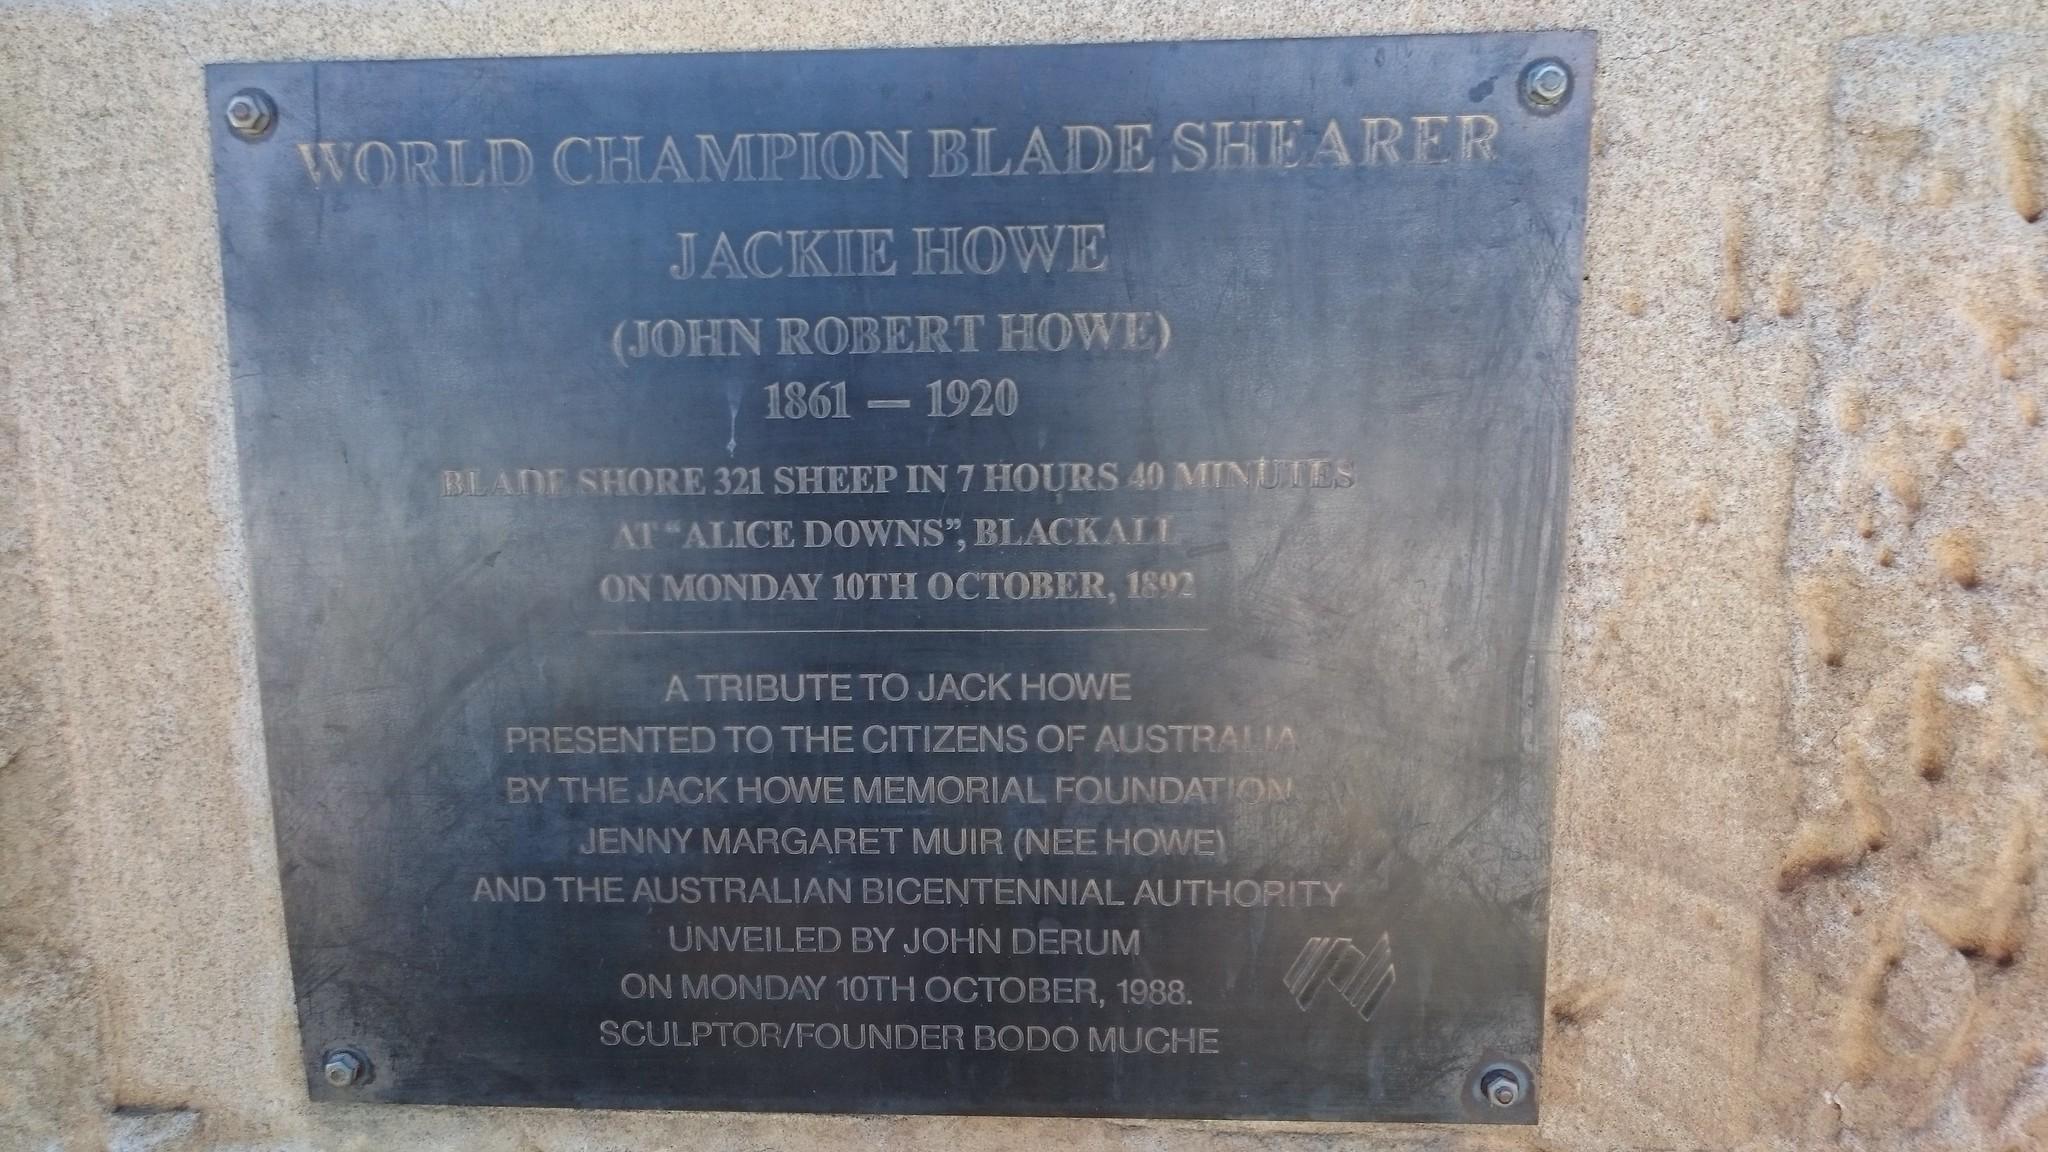 Blackall - the story of Jackie Howe